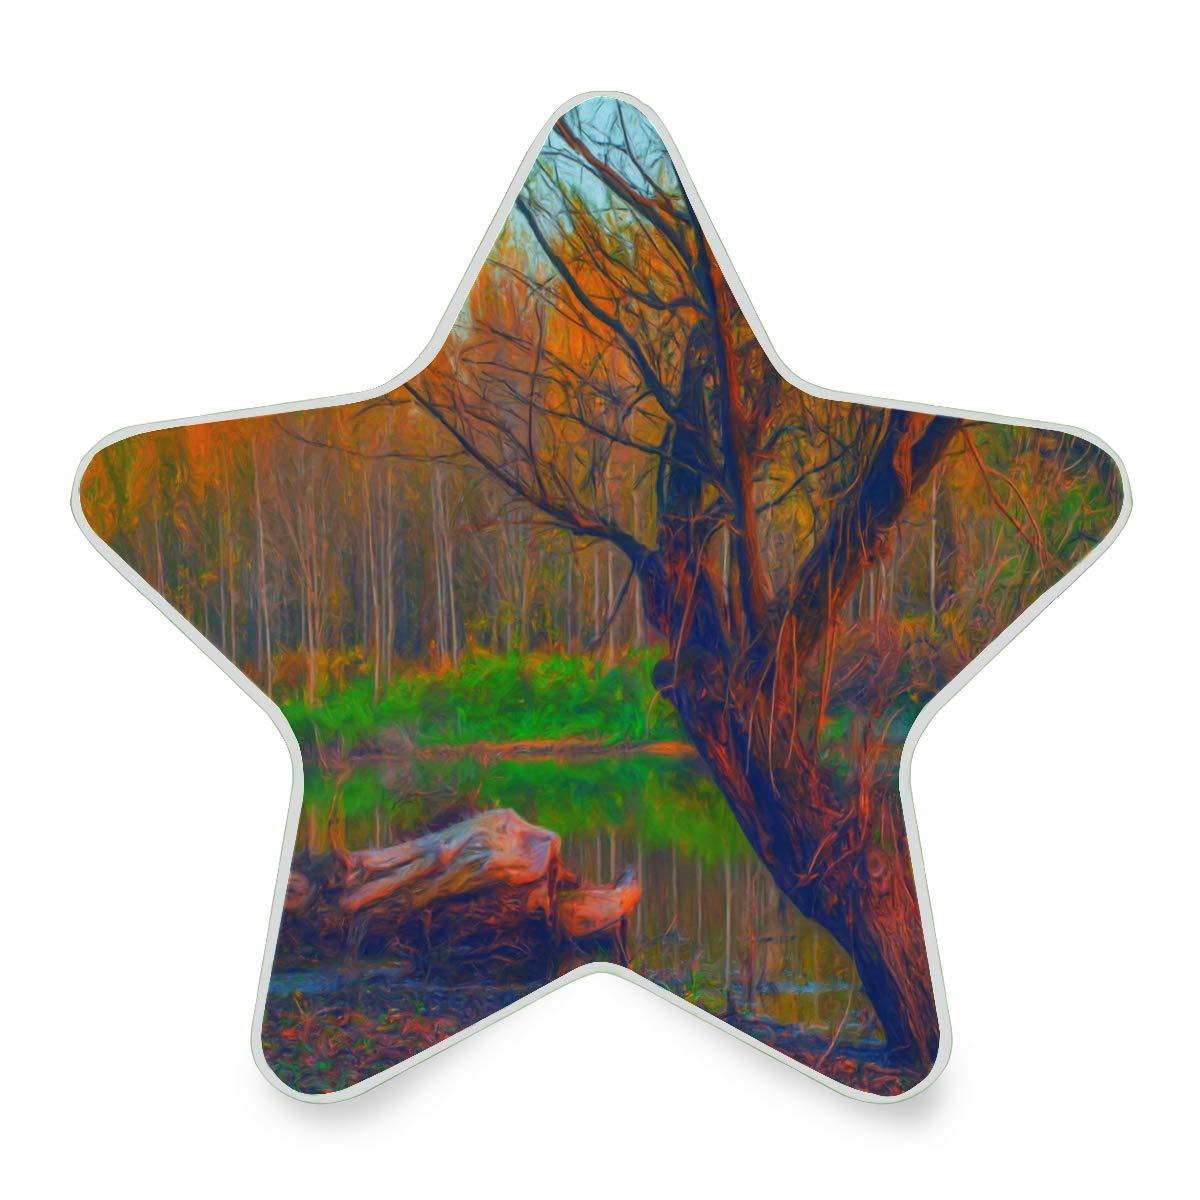 Mini Night Light Landscape Painting Showing Forest On Gloomy Autumn Day Star Pentagram Shaped Nightlight Children's Bedroom Cute Plug in Light Decoration Emergency Lamp for Kids Girls Boys Childrens